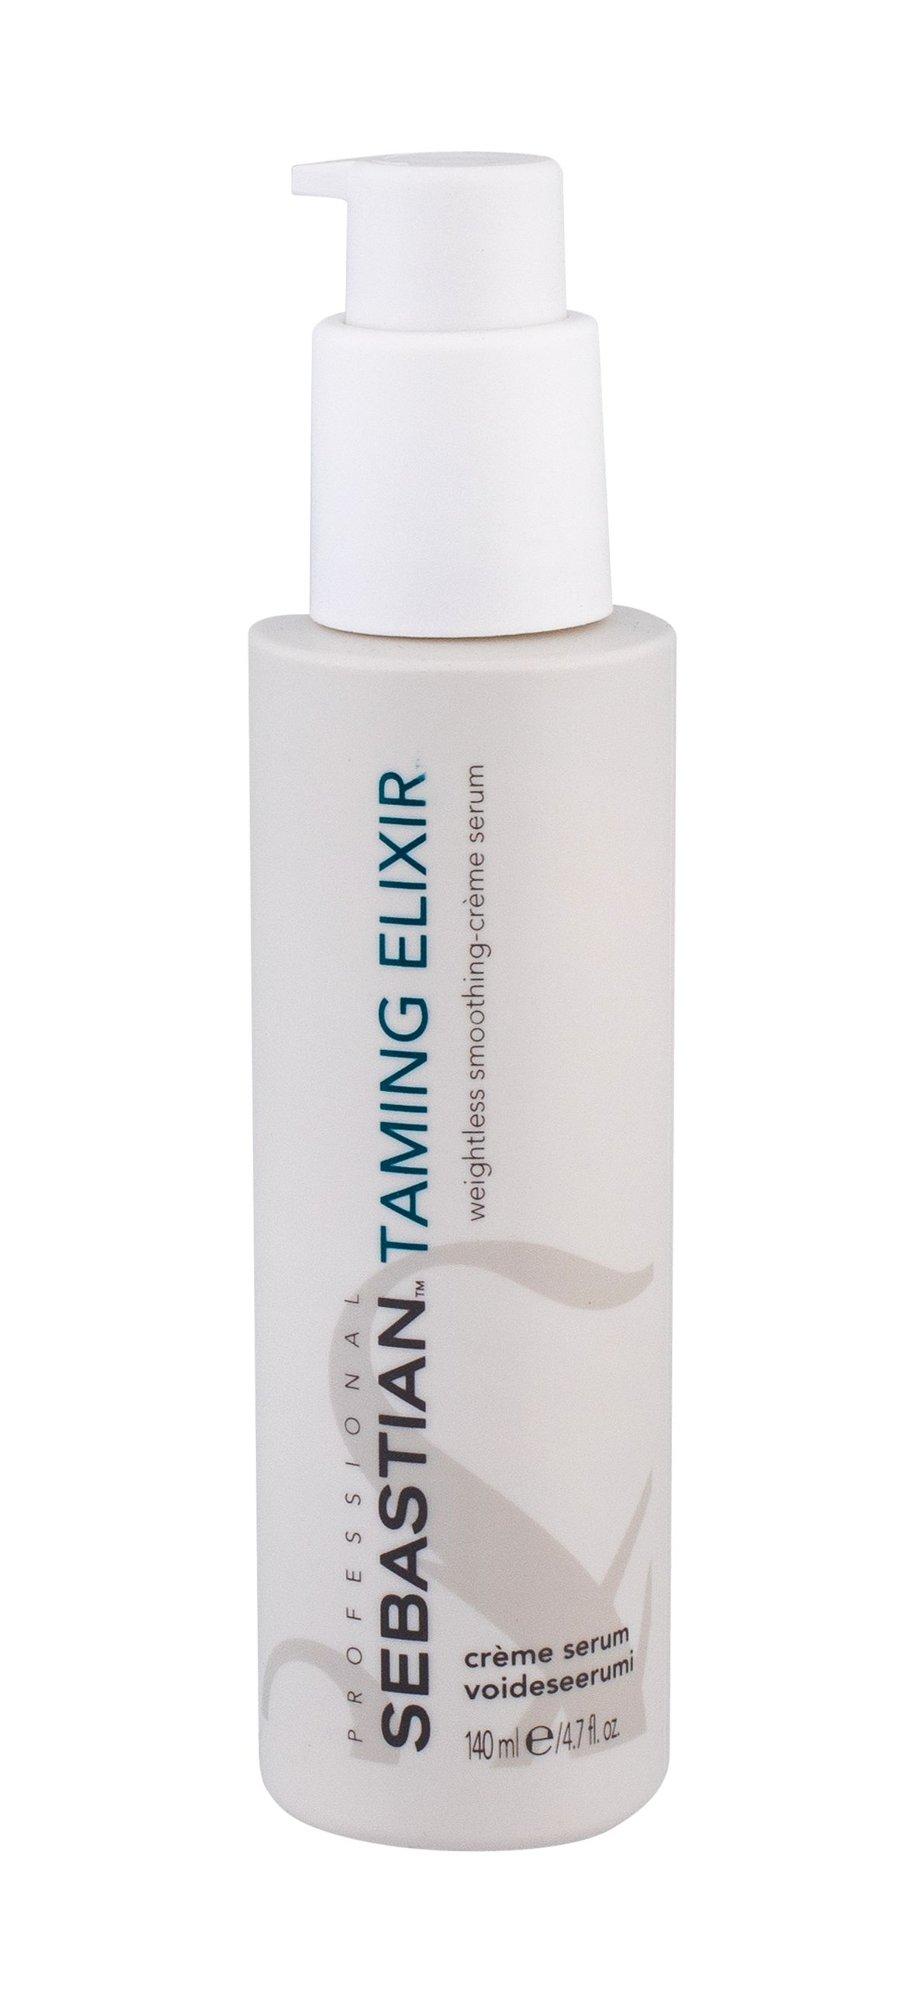 Sebastian Professional Taming Elixir Cosmetic 140ml